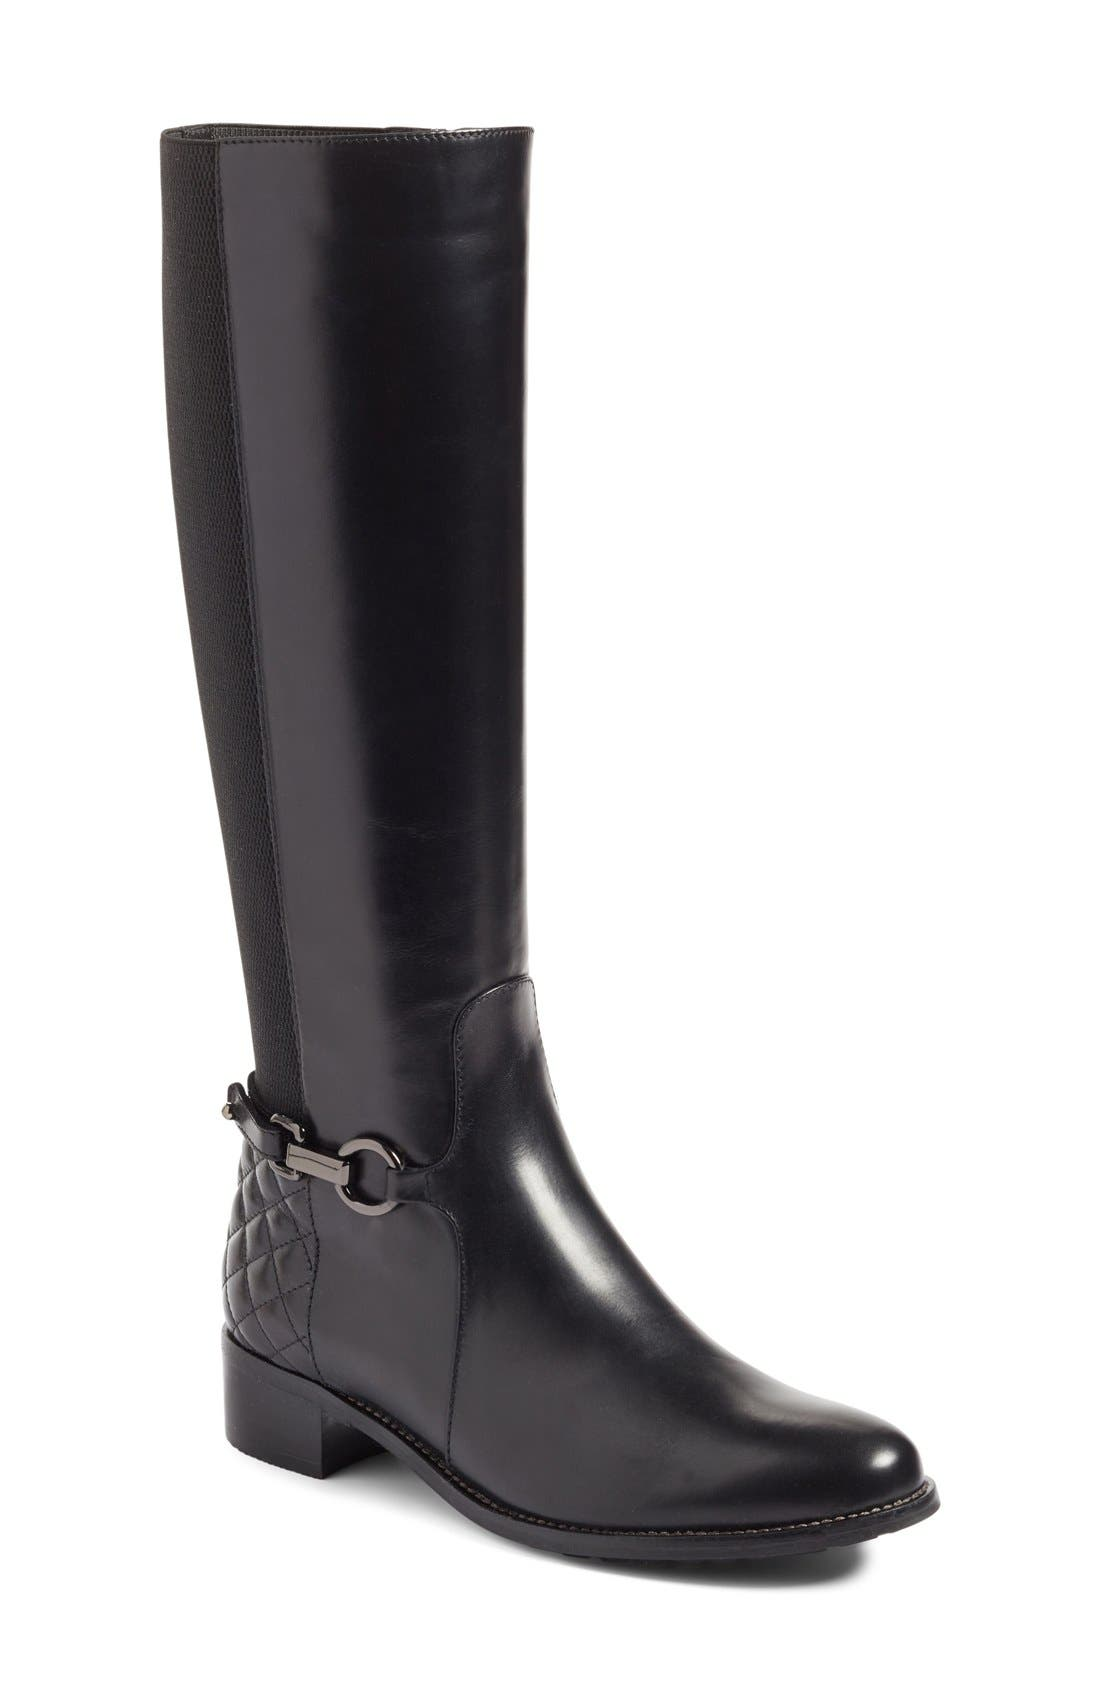 Alternate Image 1 Selected - Aquatalia Oksana Weatherproof Riding Boot (Women)